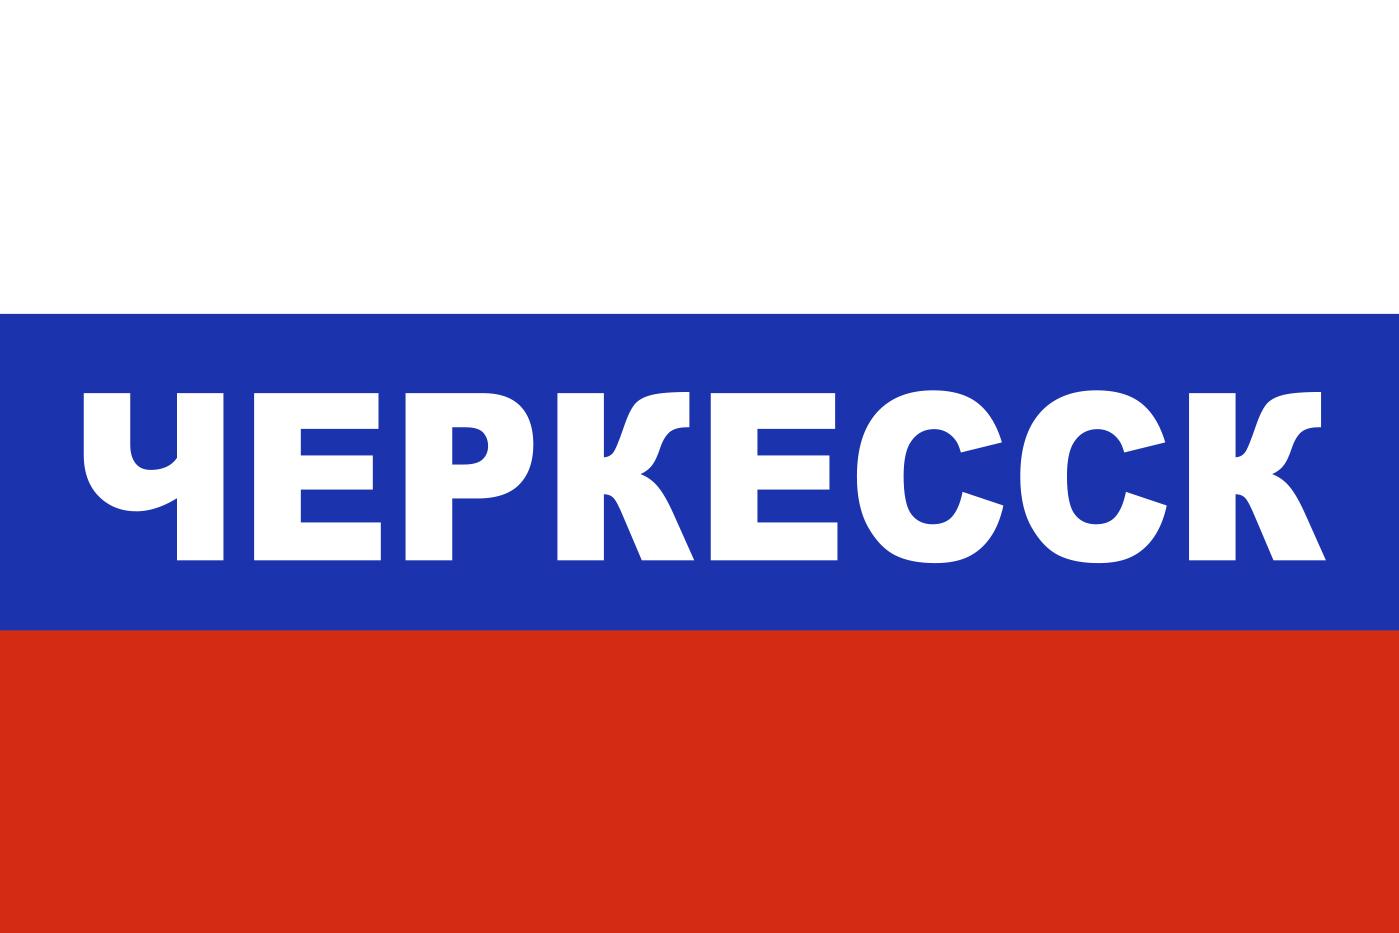 Флаг триколор Черкесск